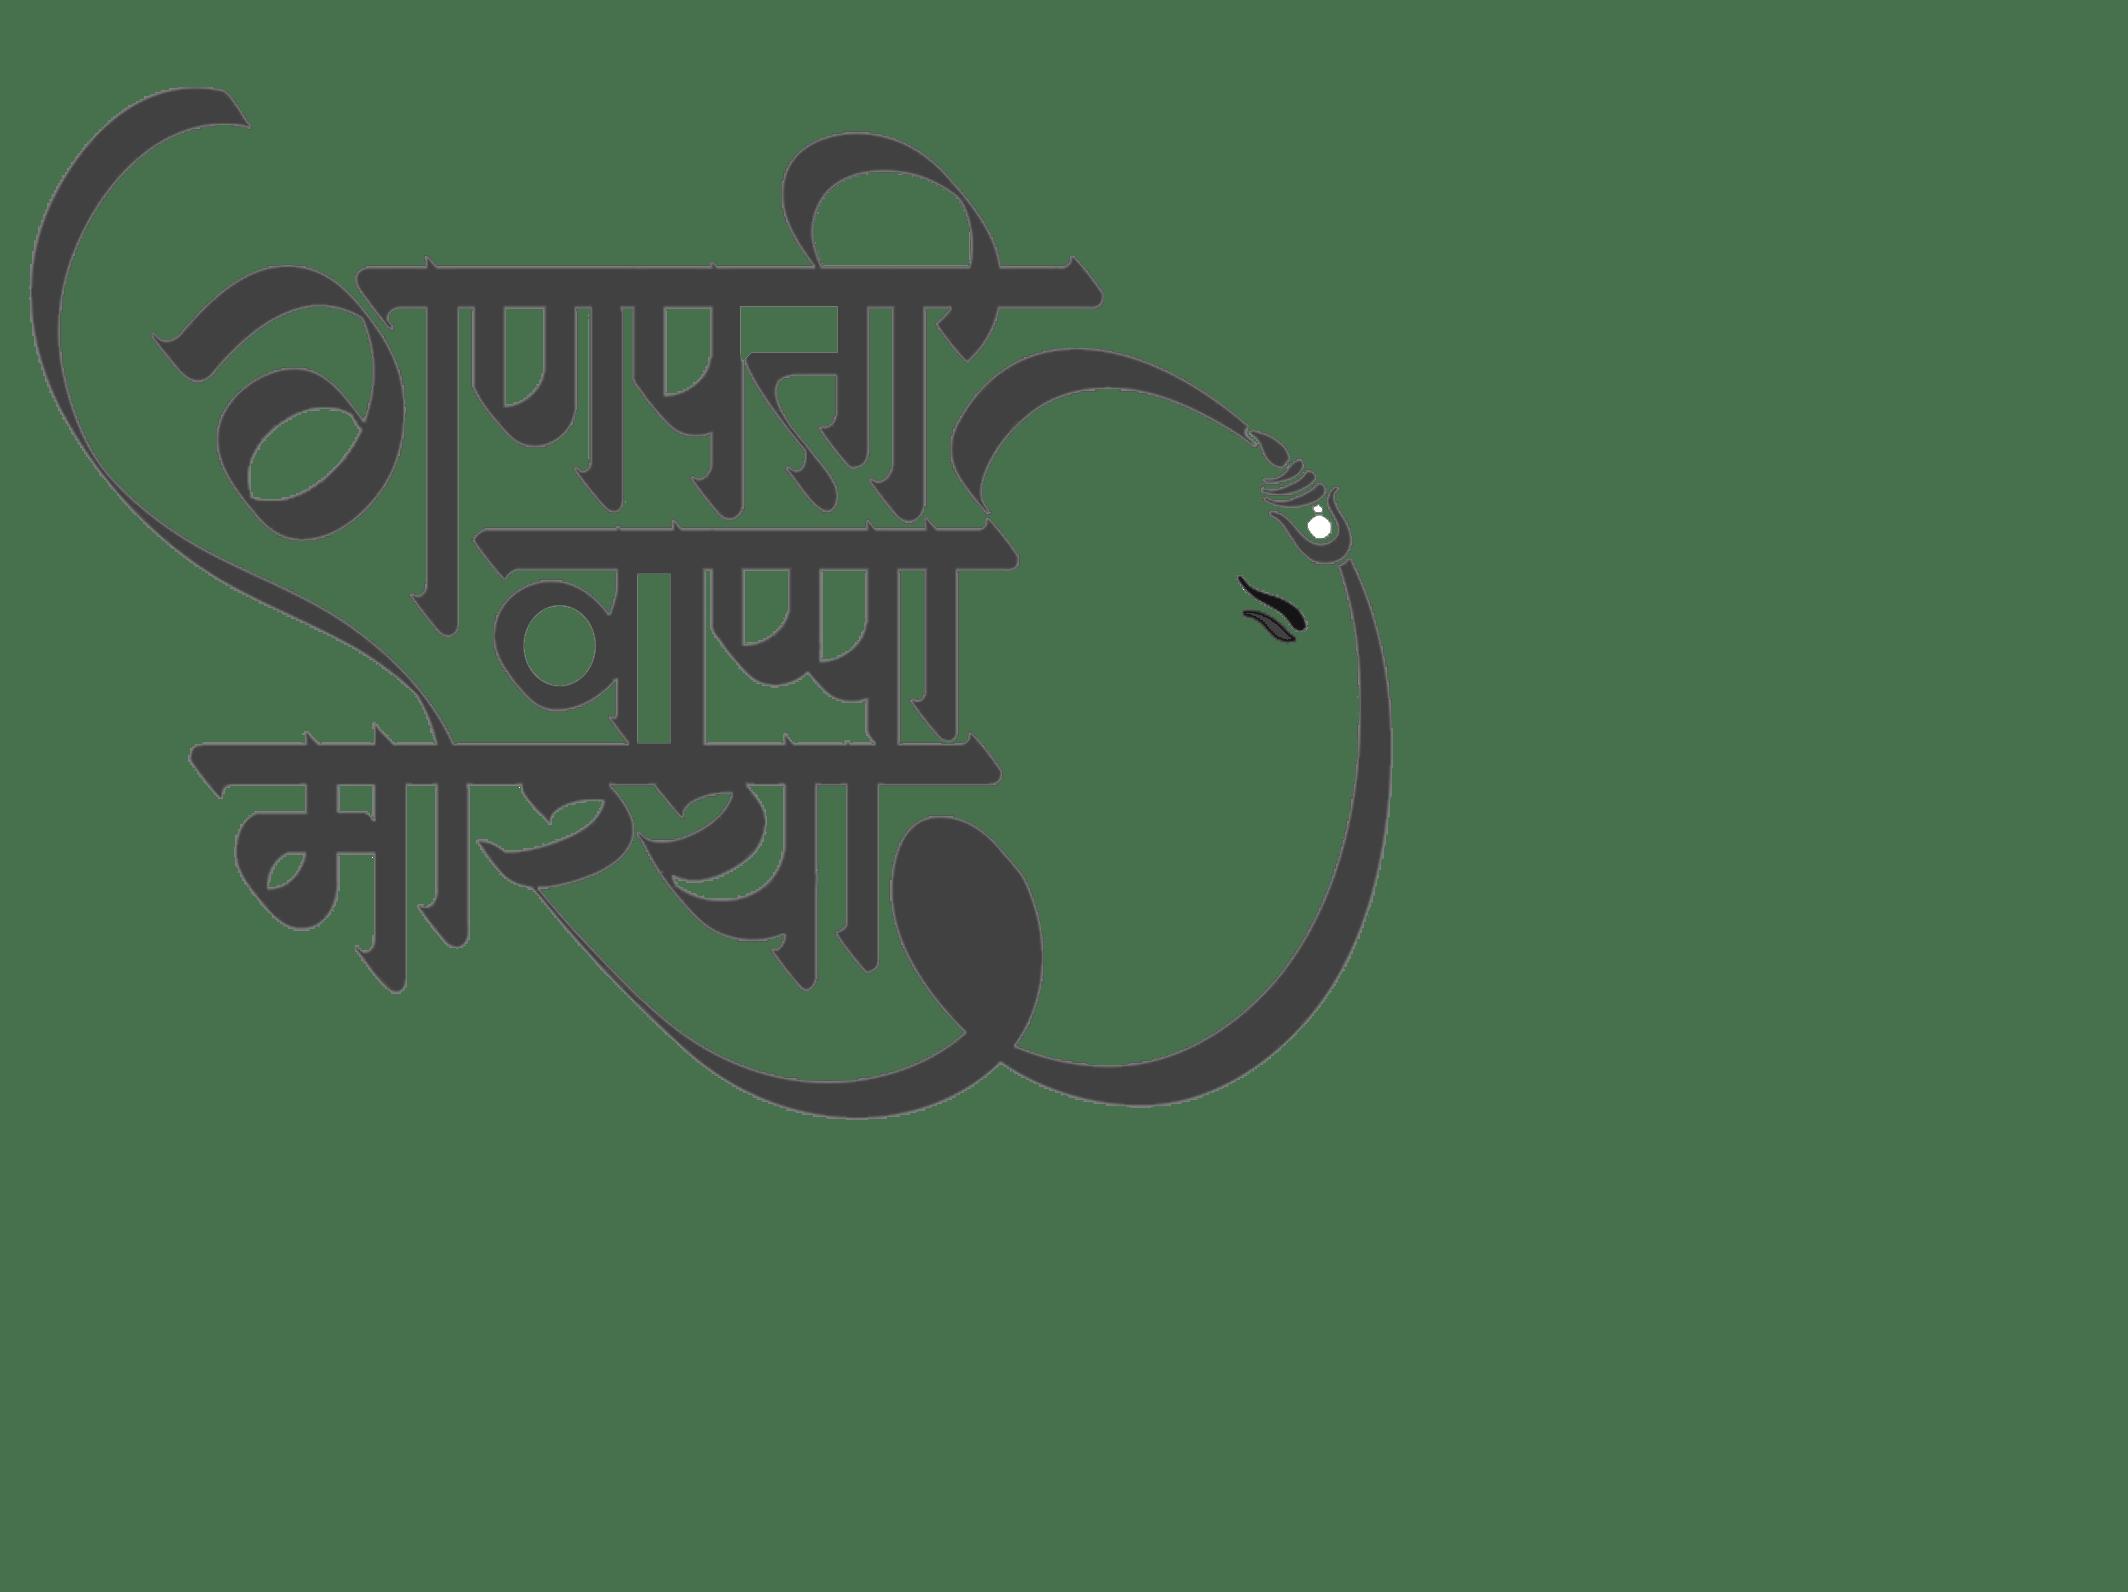 Ganpati bappa morya logo clipart svg free download Ganpati Bappa Morya Logo Png , (+) Png Group - romolagarai.org< svg free download